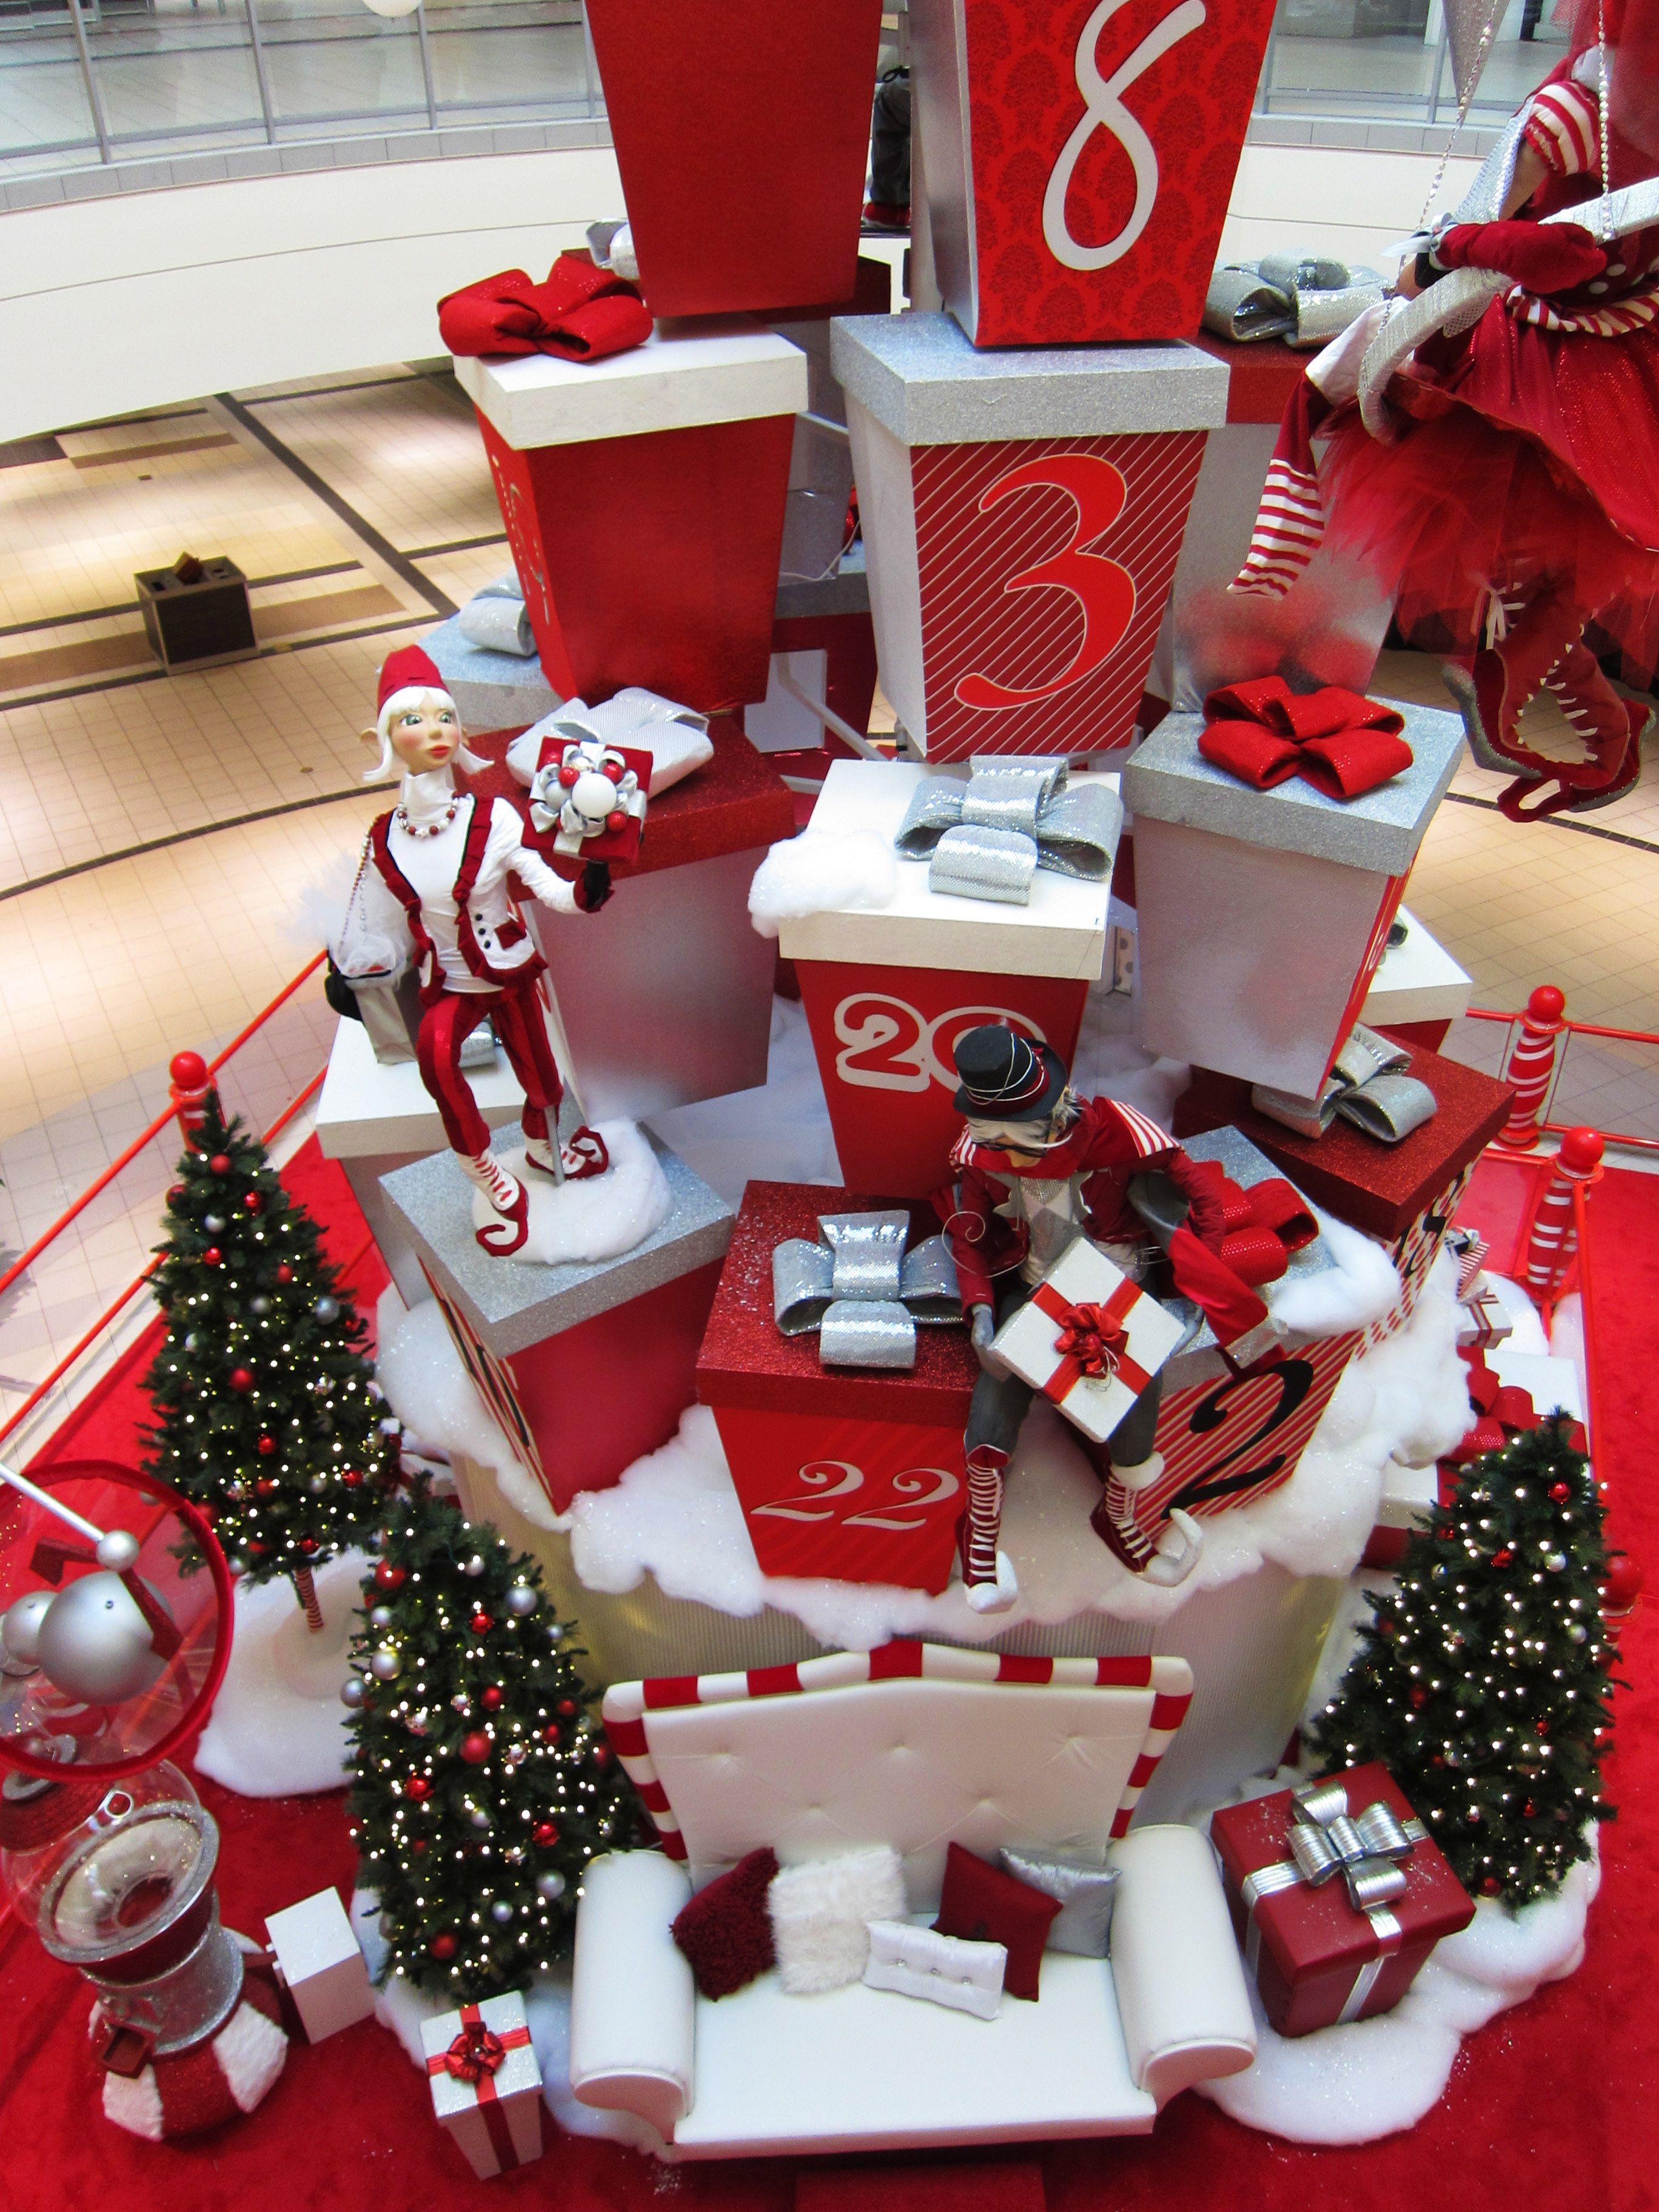 Christmas decor / Décor de Noël / Upper Canada Mall